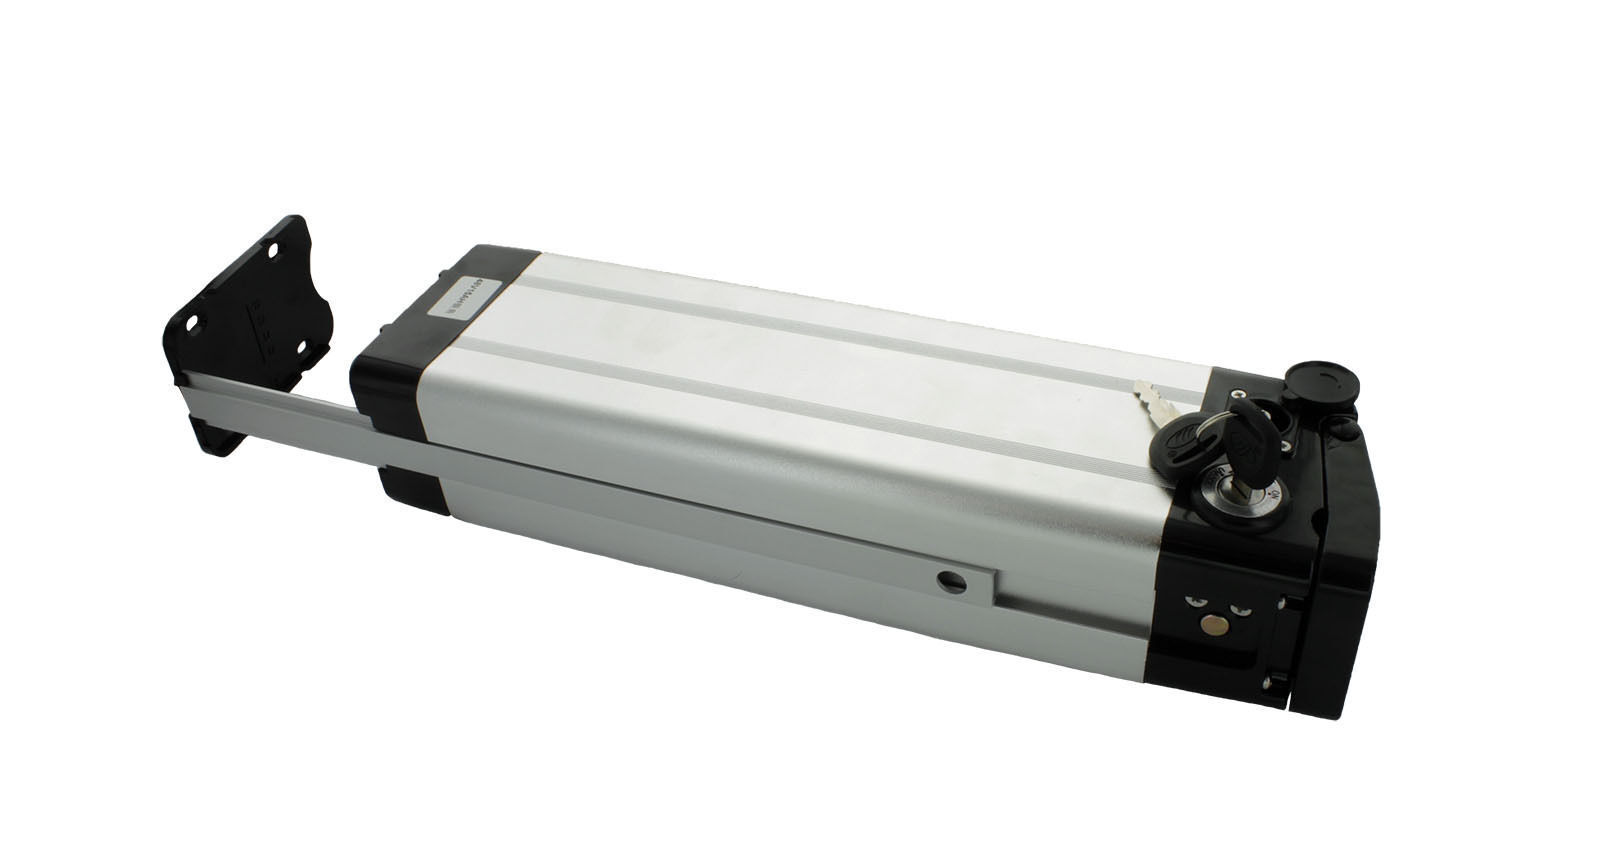 24V-10AH 24V-10AH 24V-10AH Li-Ion e-bike Batterie,niedrige Temperatur Effekt,Dose Arbeiten in -20 | Deutschland Shop  f04c35